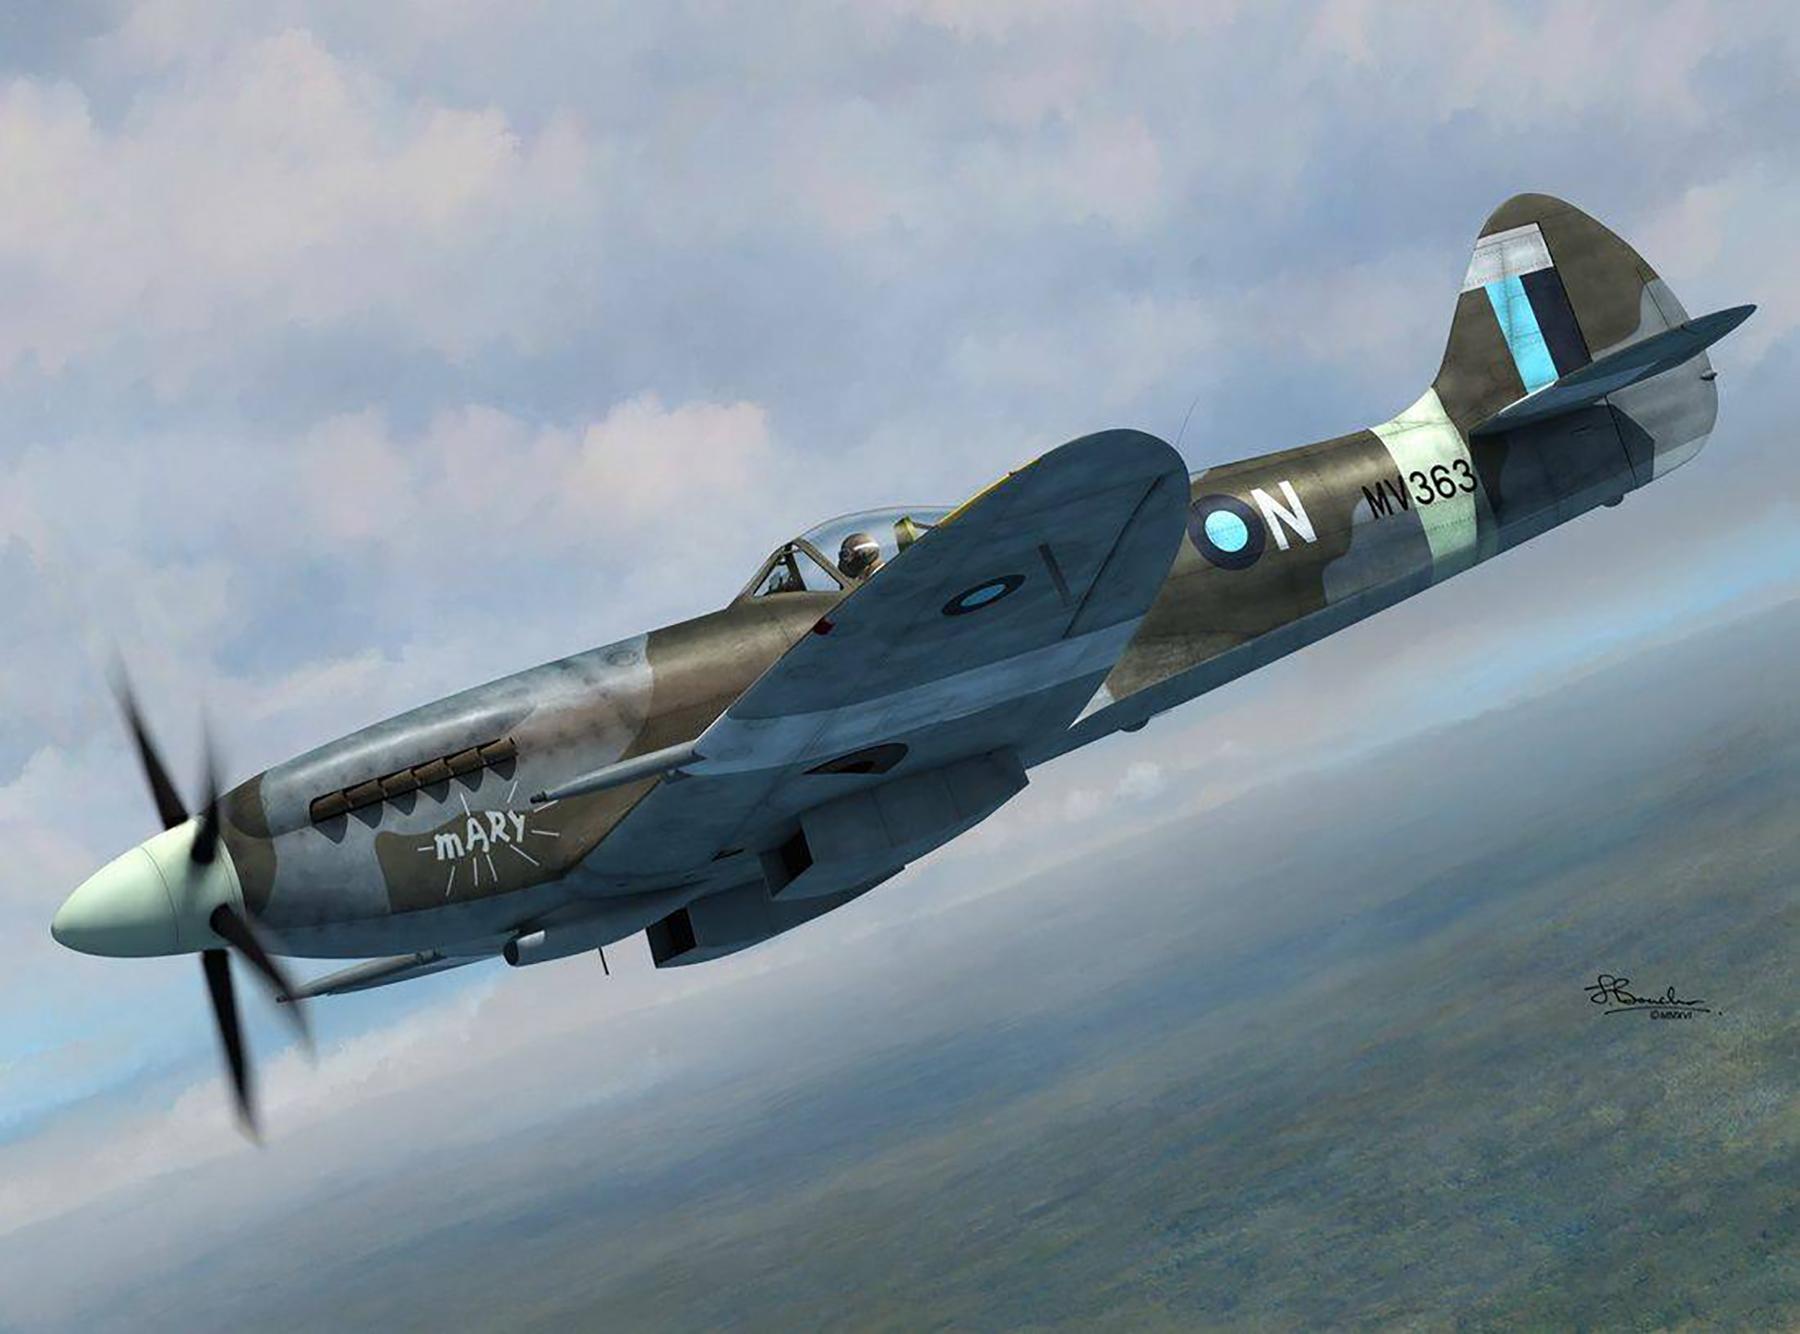 Spitfire FRXIVe RAF 11Sqn Mary MV363 by Jerry Boucher Art 0A